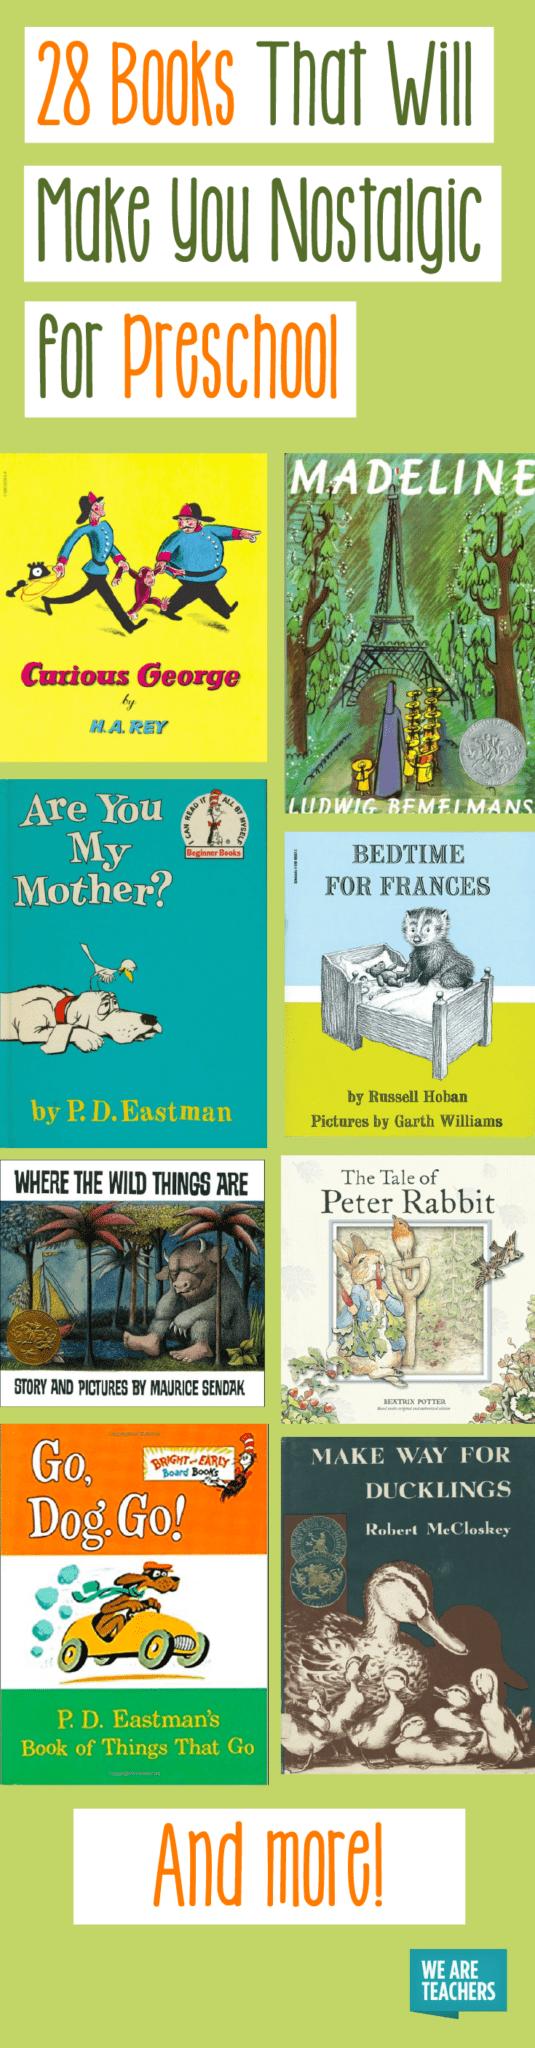 Best Classic Picture Books for the Classroom - WeAreTeachers